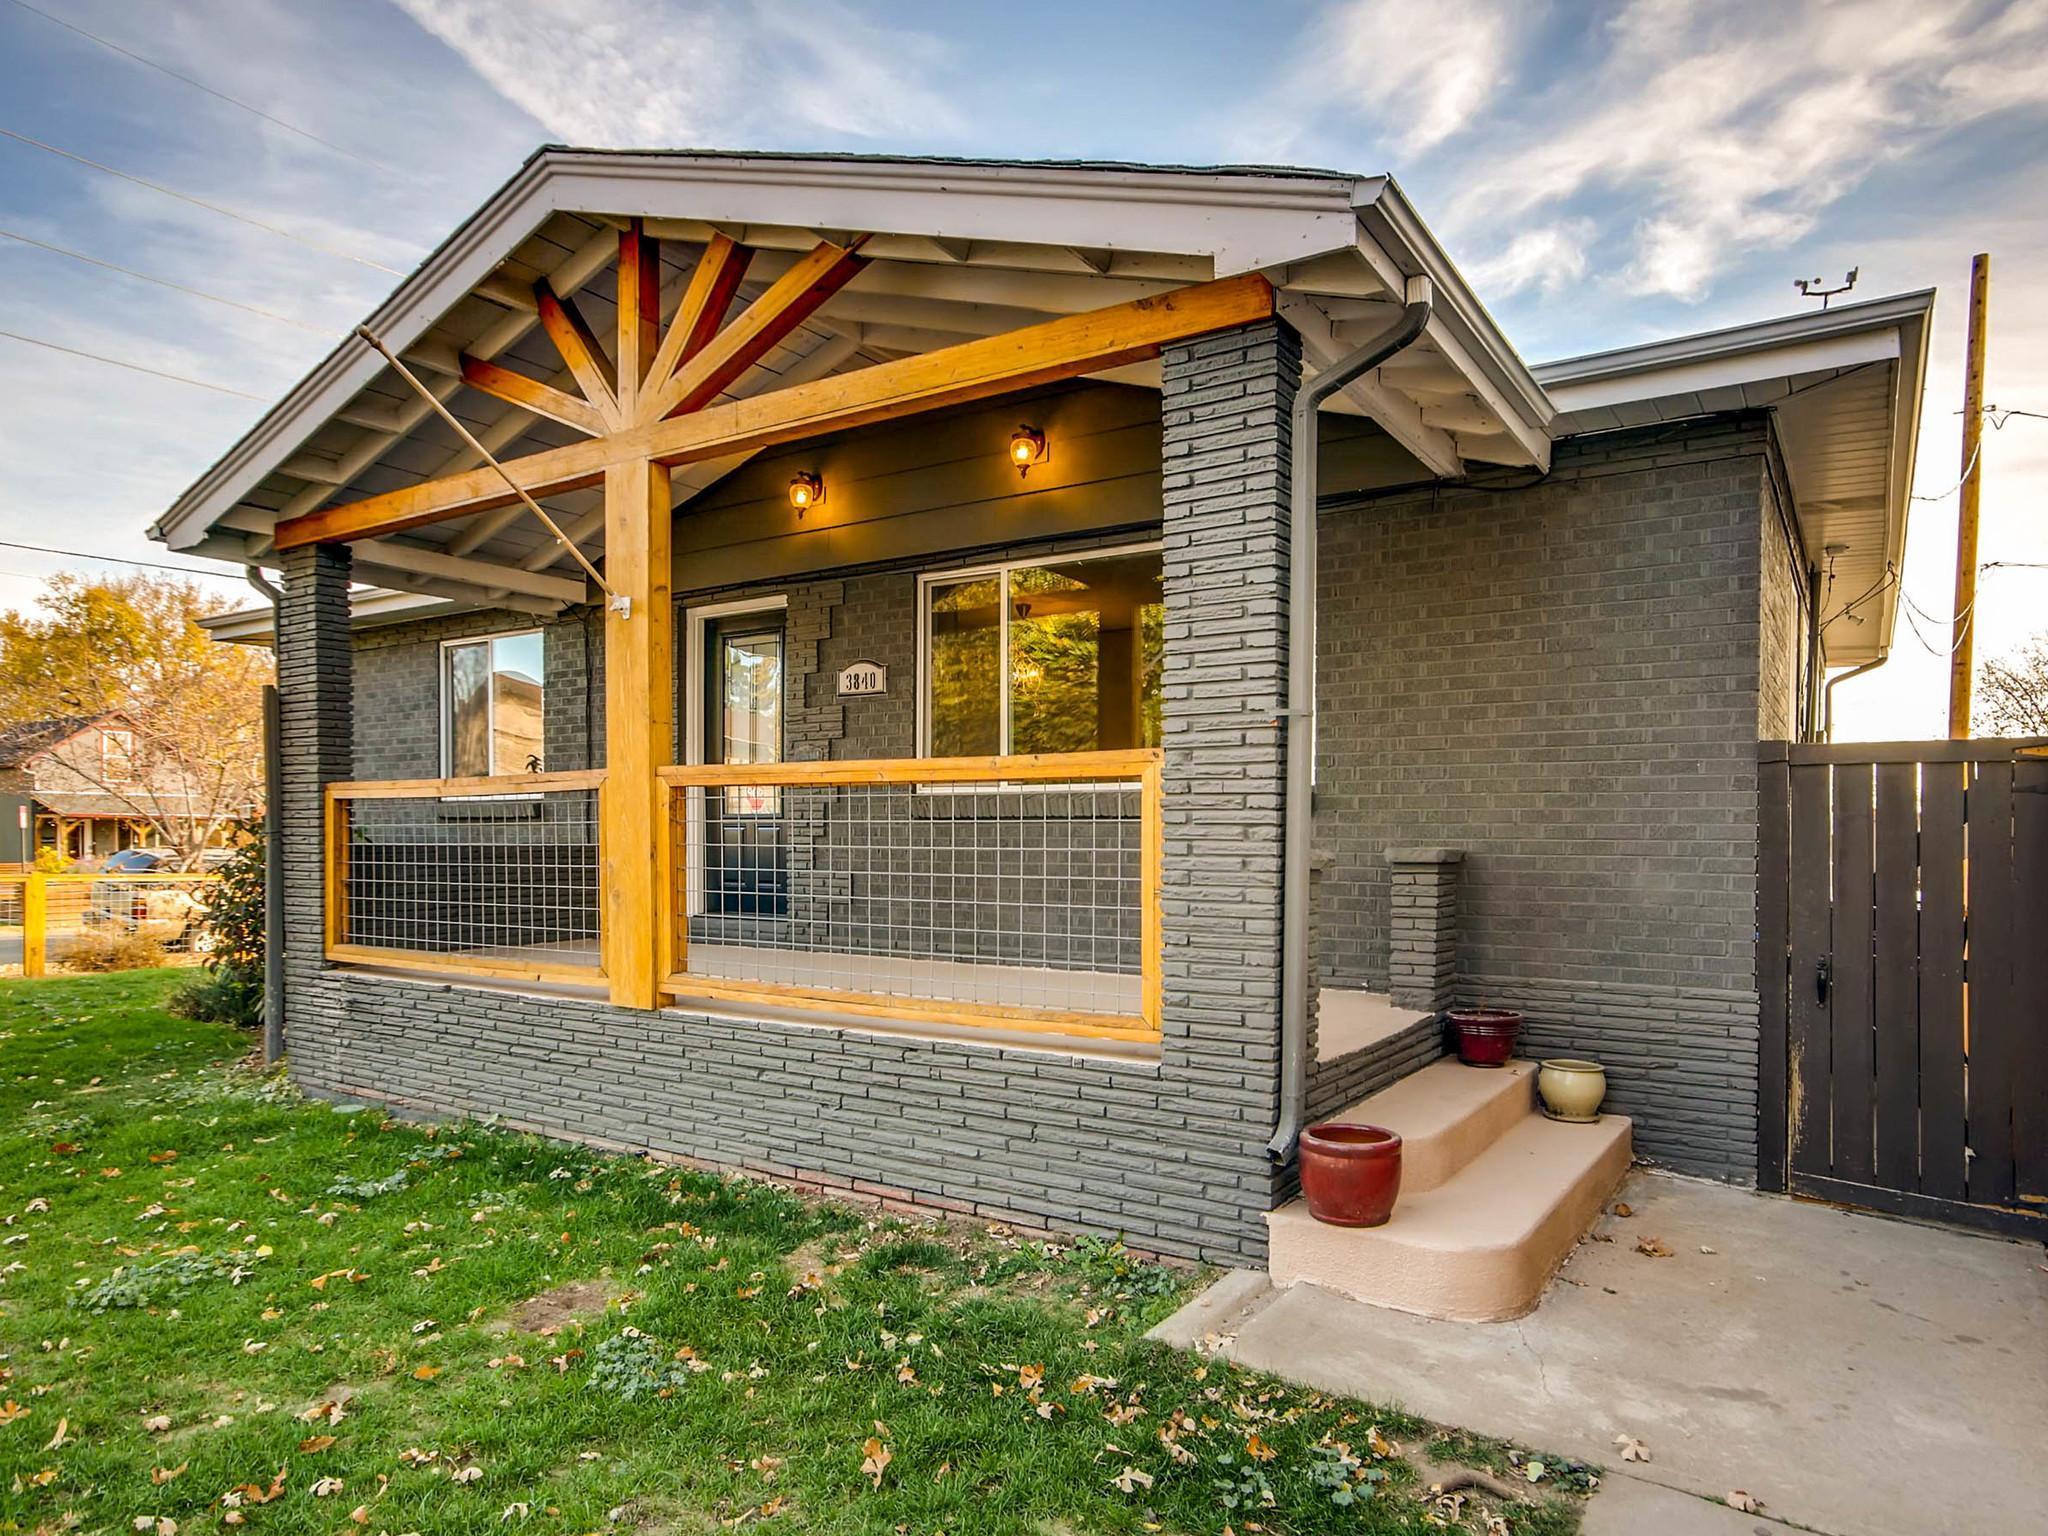 3880 Shoshone St For Rent - Denver, CO | Trulia